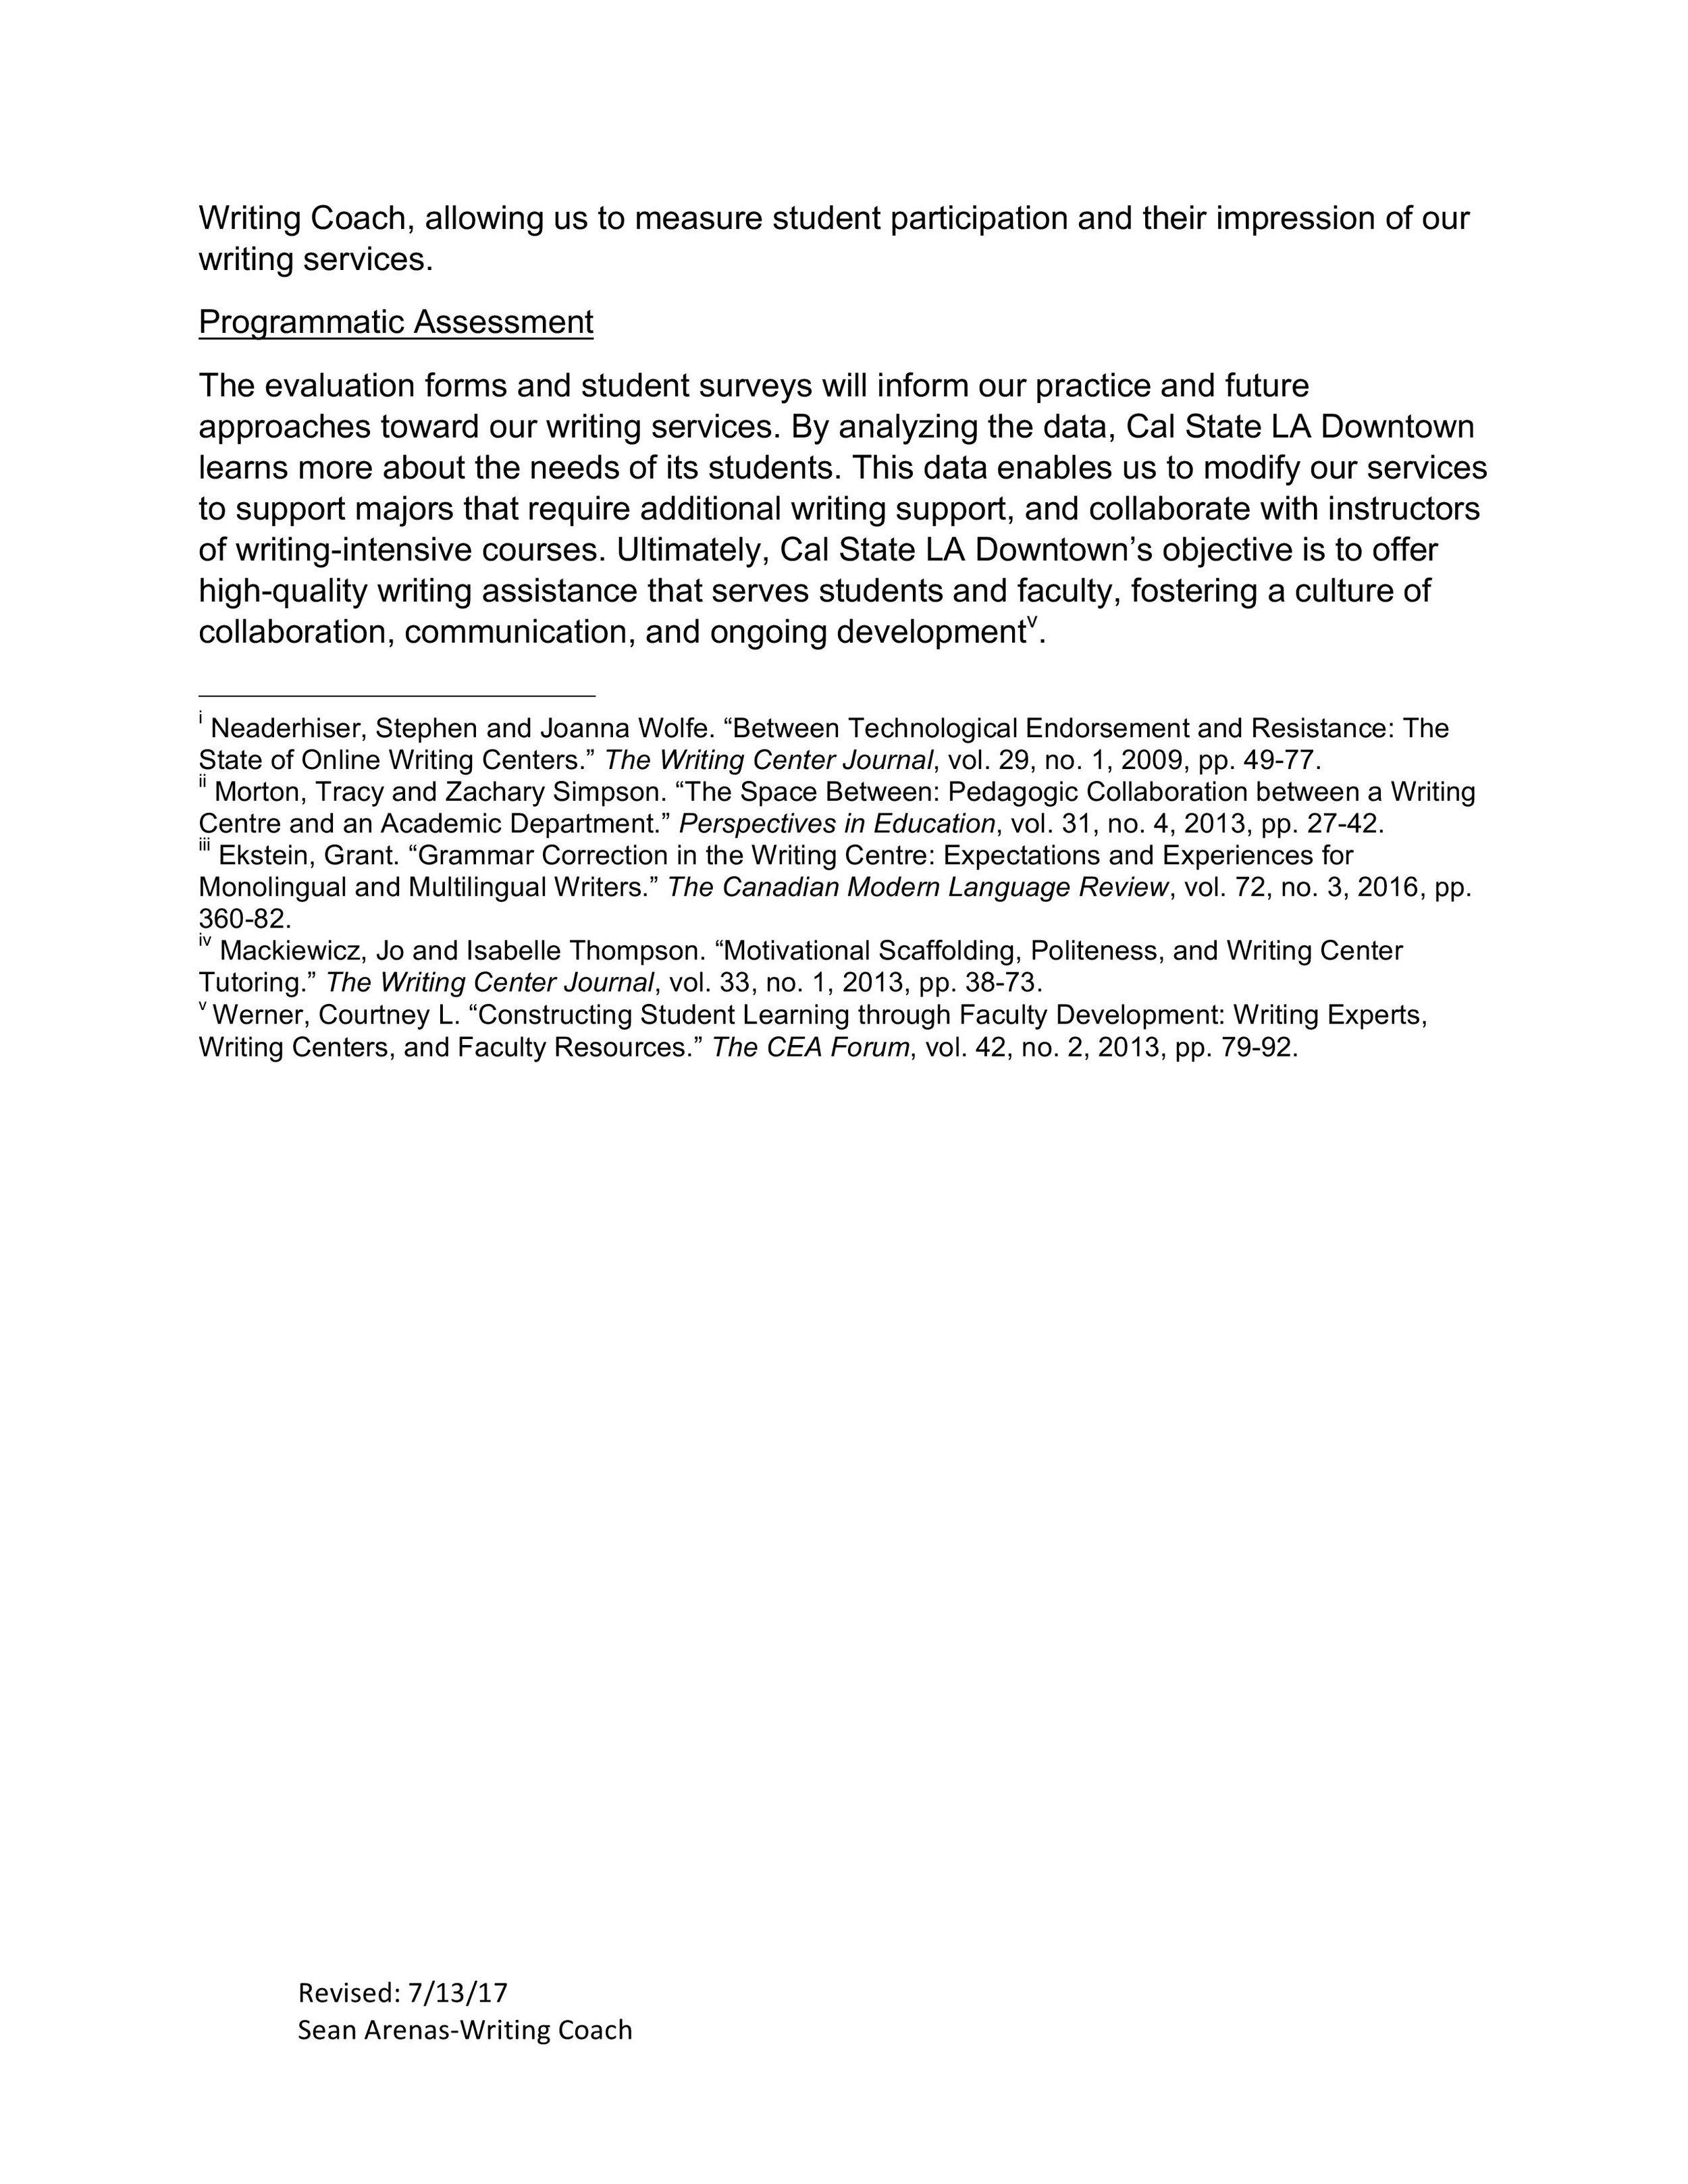 SEAN ARENAS_ADMINISTRATIVE_MANUAL-page-003.jpg